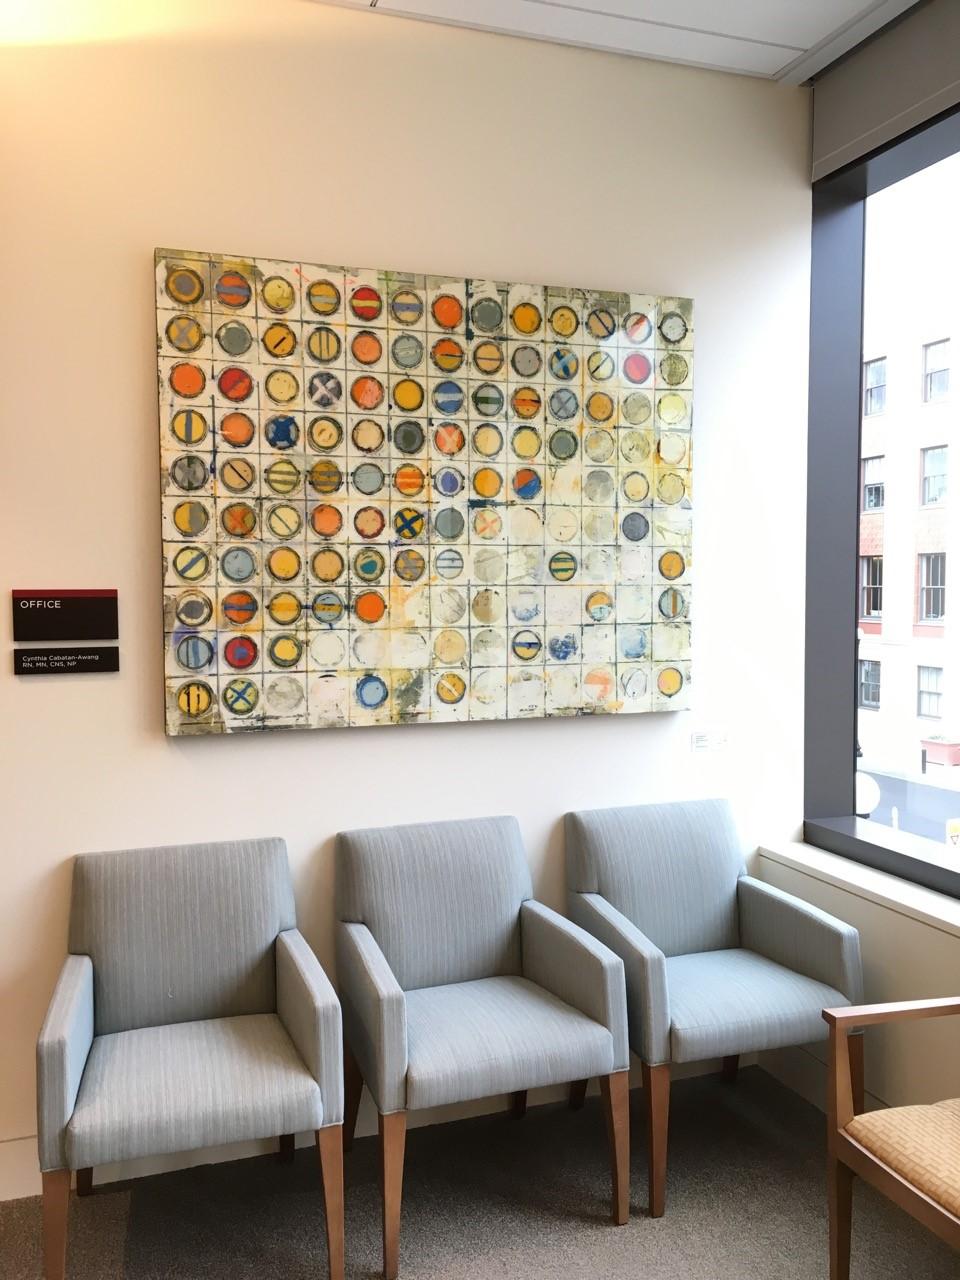 Stanford Medical Center Installation